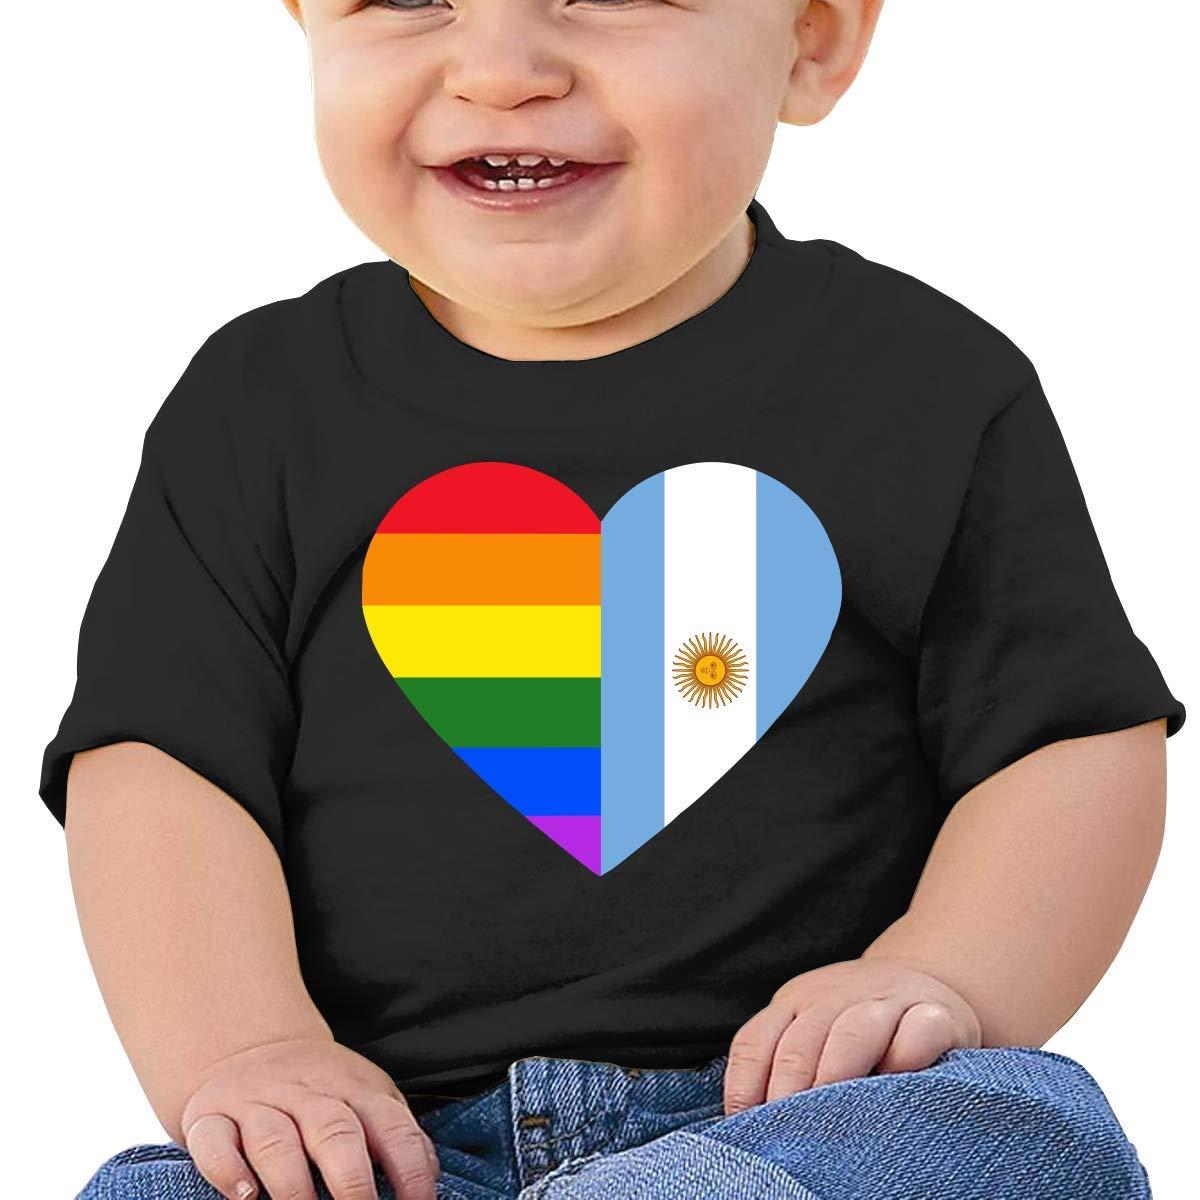 LGBT Rainbow Argentina Flag Heart Baby Boy Girl Newborn Short Sleeve T-Shirt 6-24 Month Soft Tops